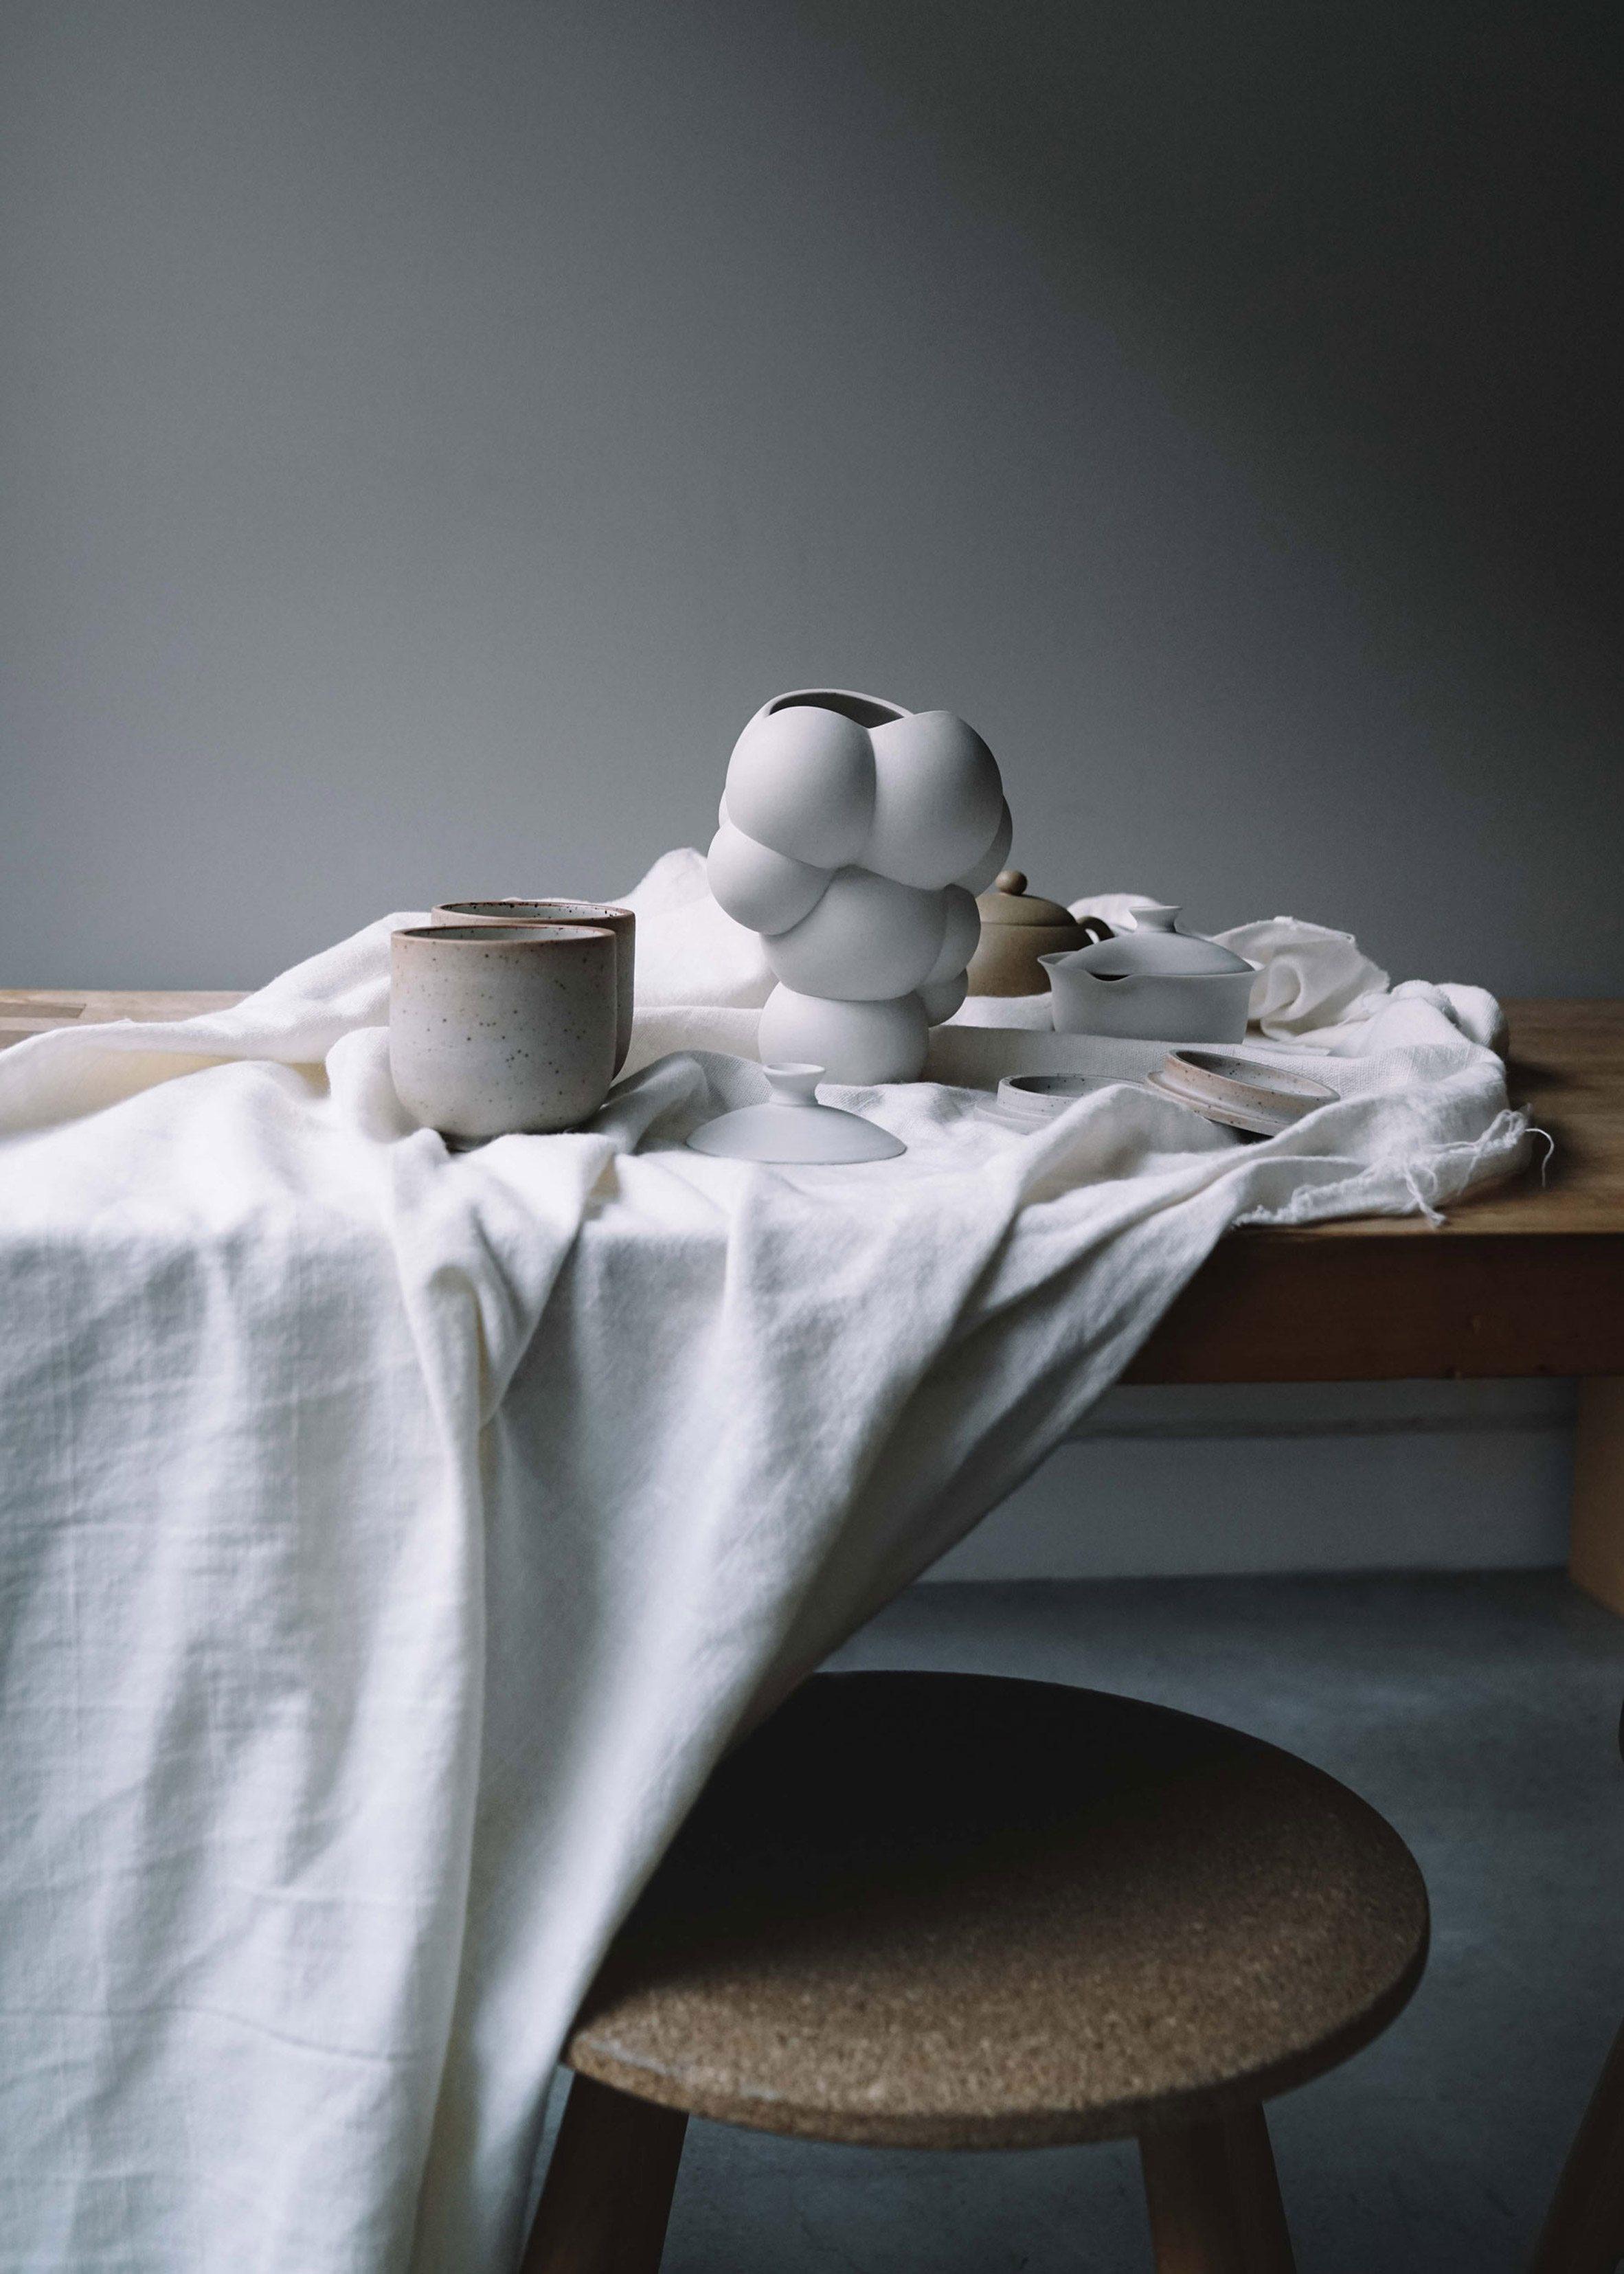 iGNANT-Design-Bjarke-Ingels-Mosss-Skum-001